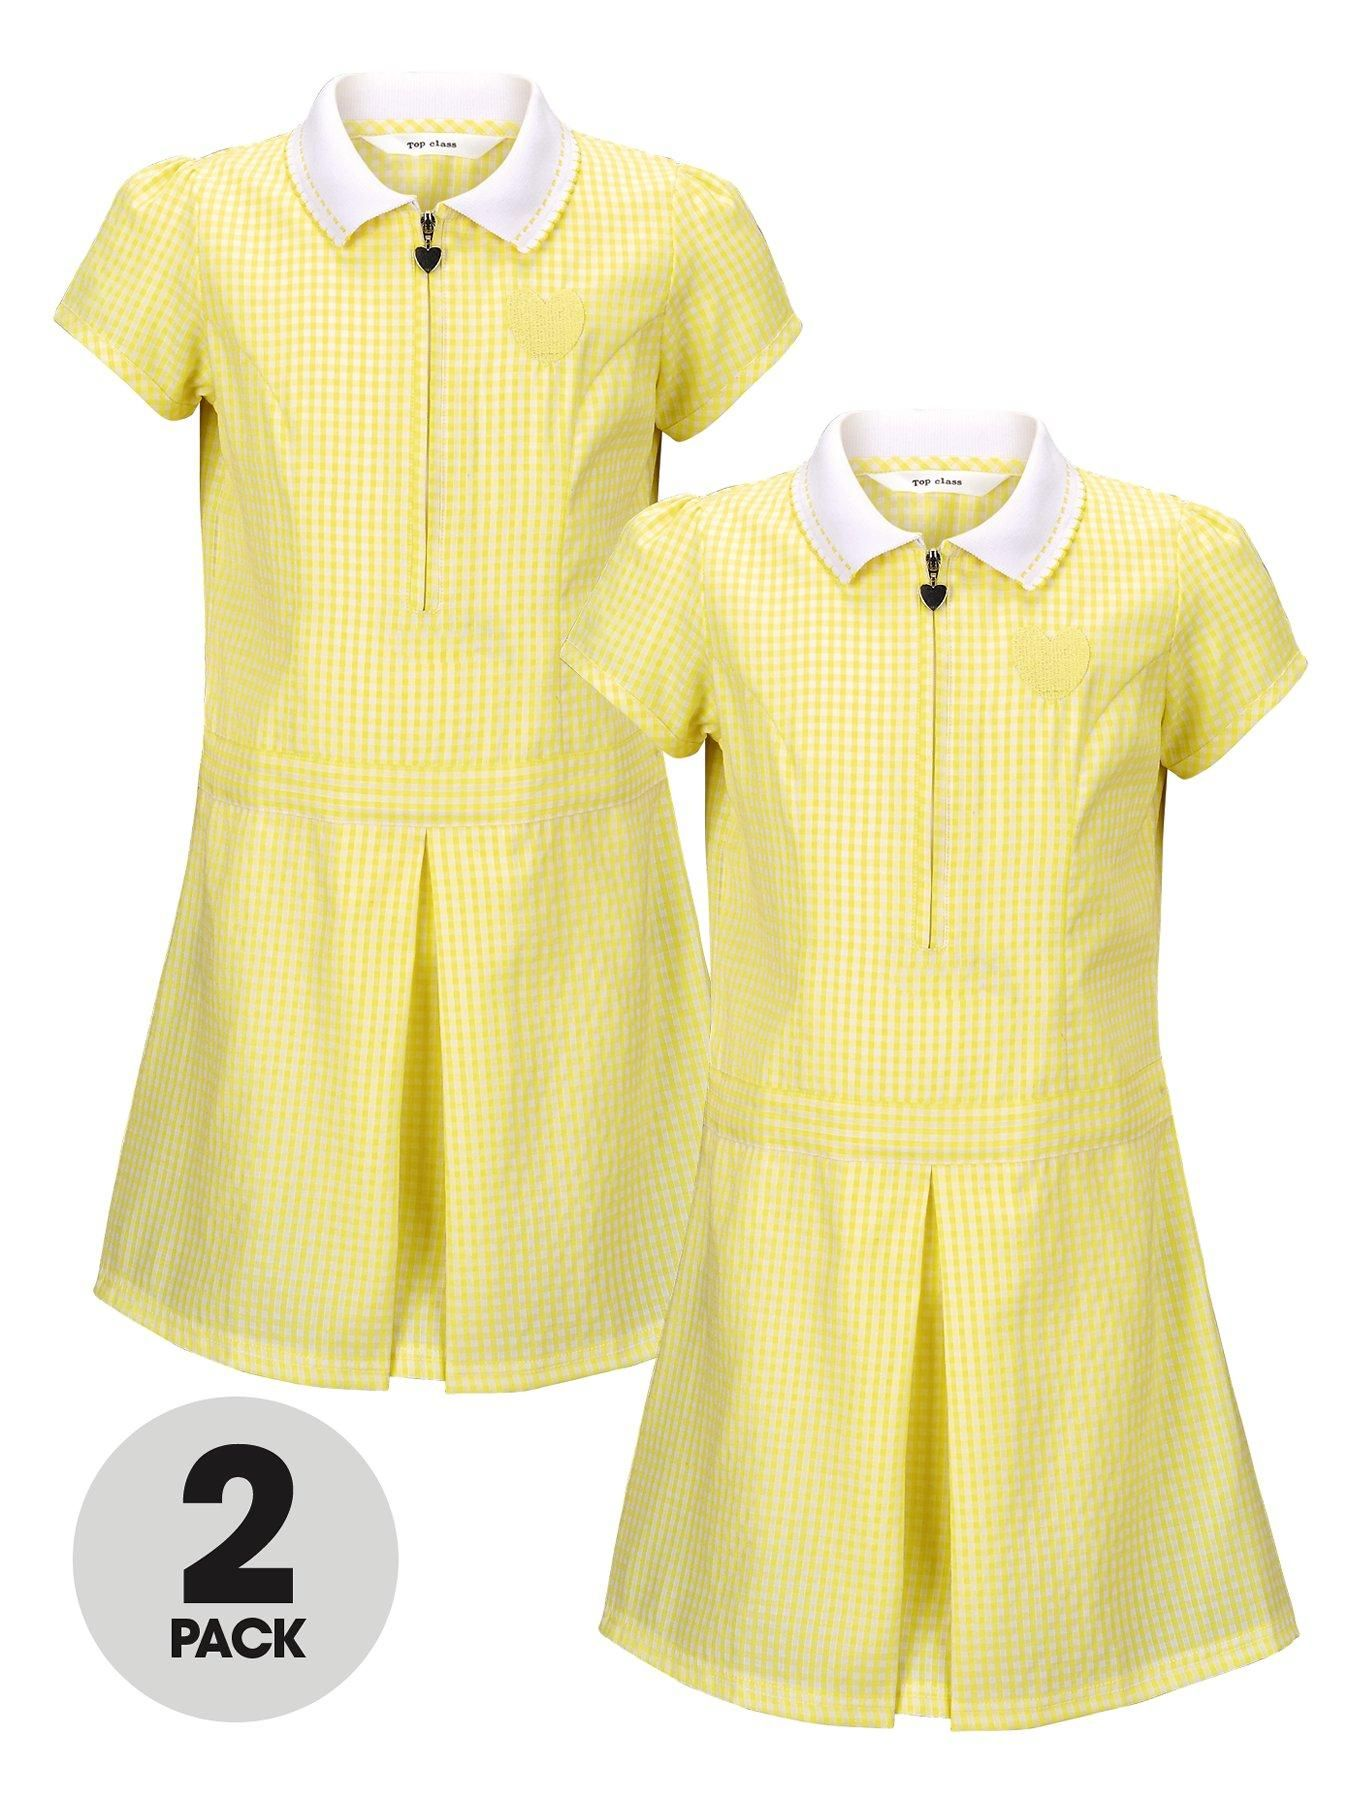 Yellow and white school summer dress